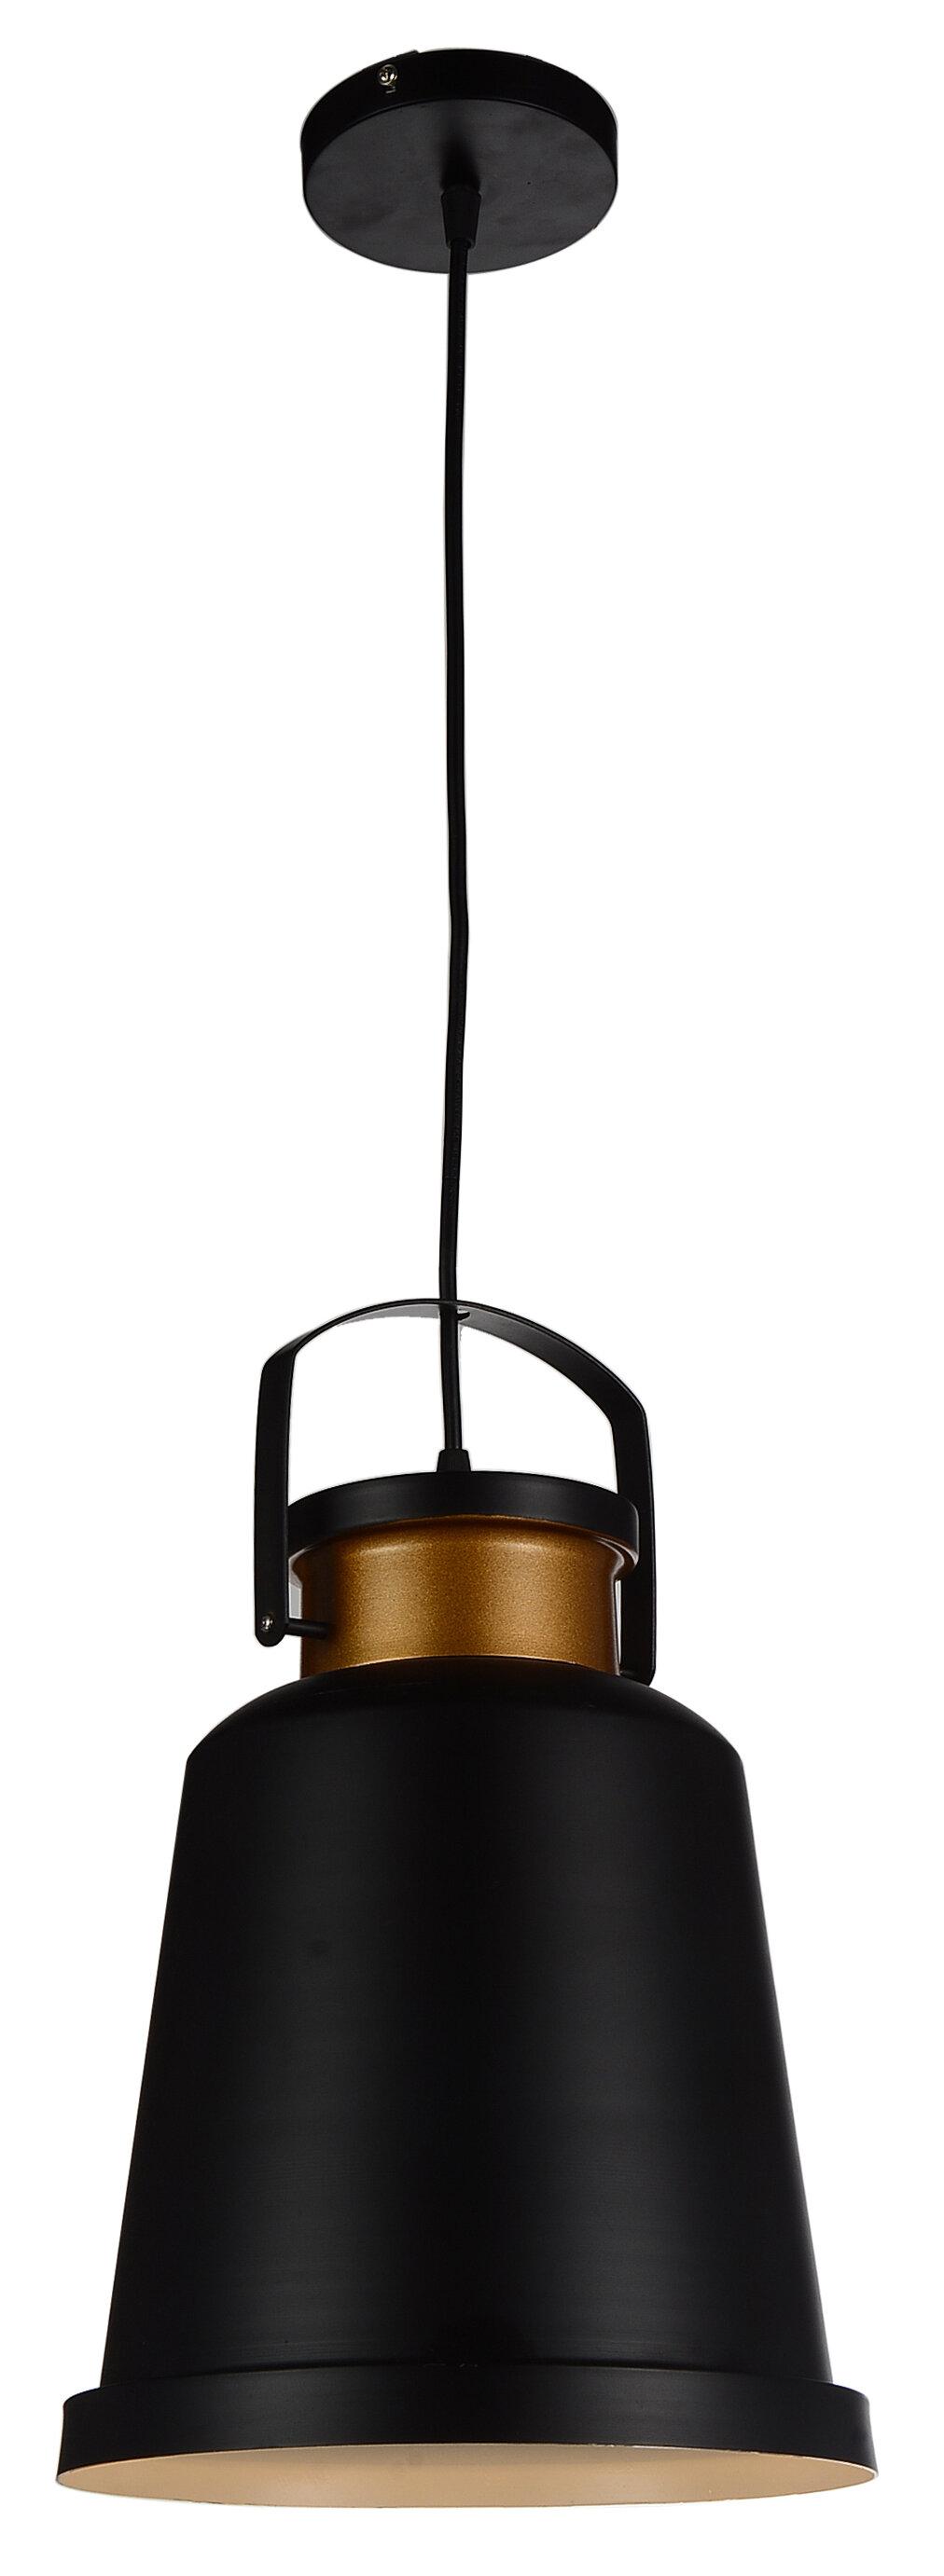 Cwilighting Elisa 1 Light Single Bell Pendant Wayfair